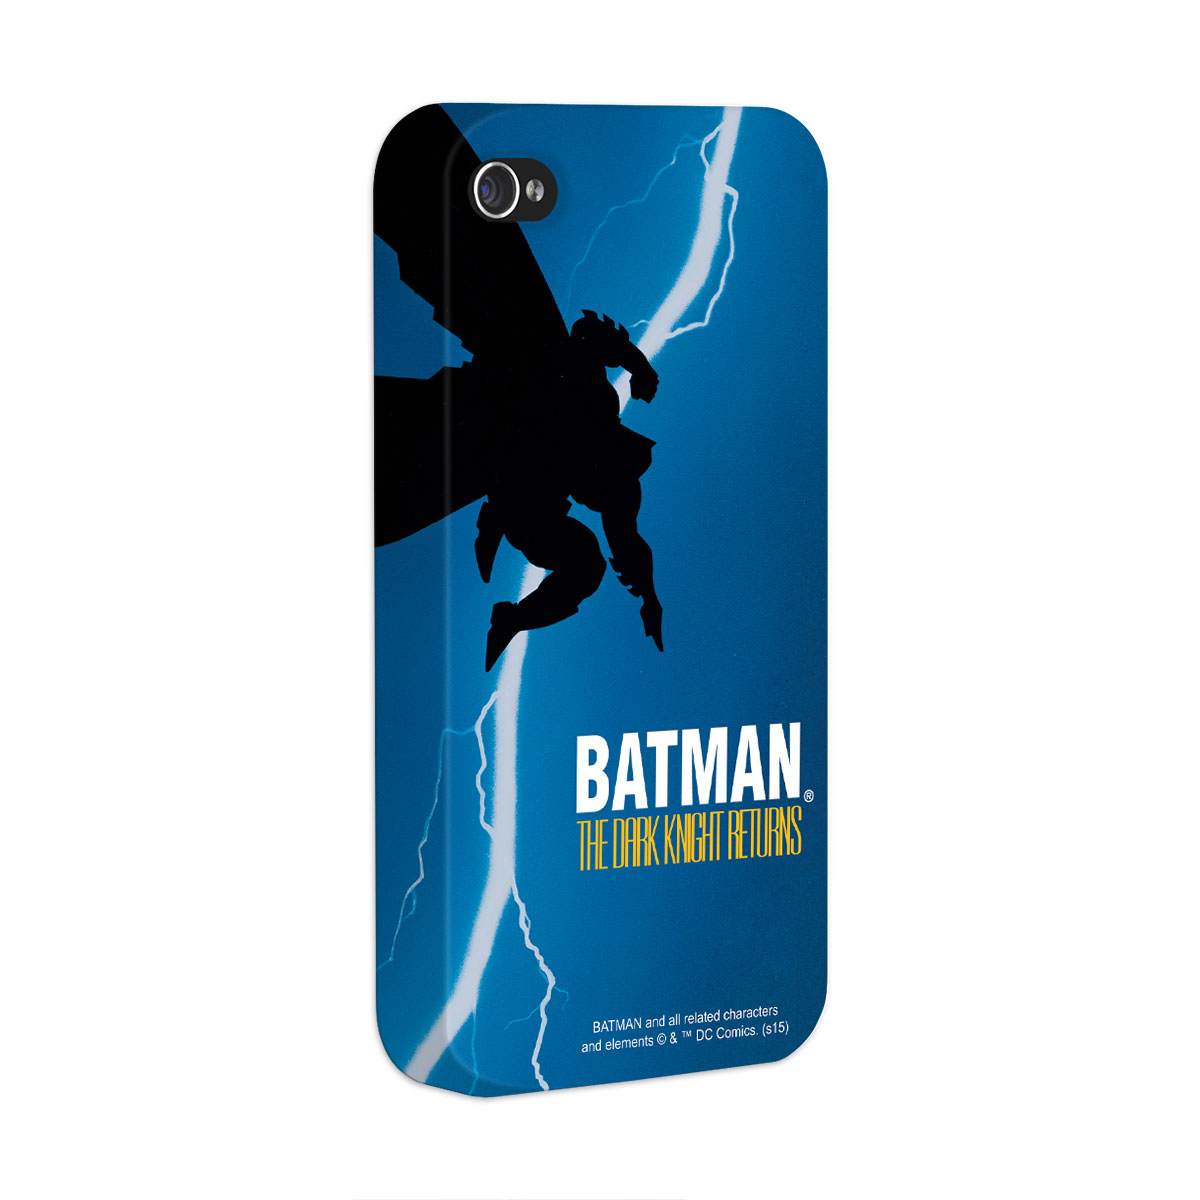 Capa para iPhone 4/4S Batman Frank Miller